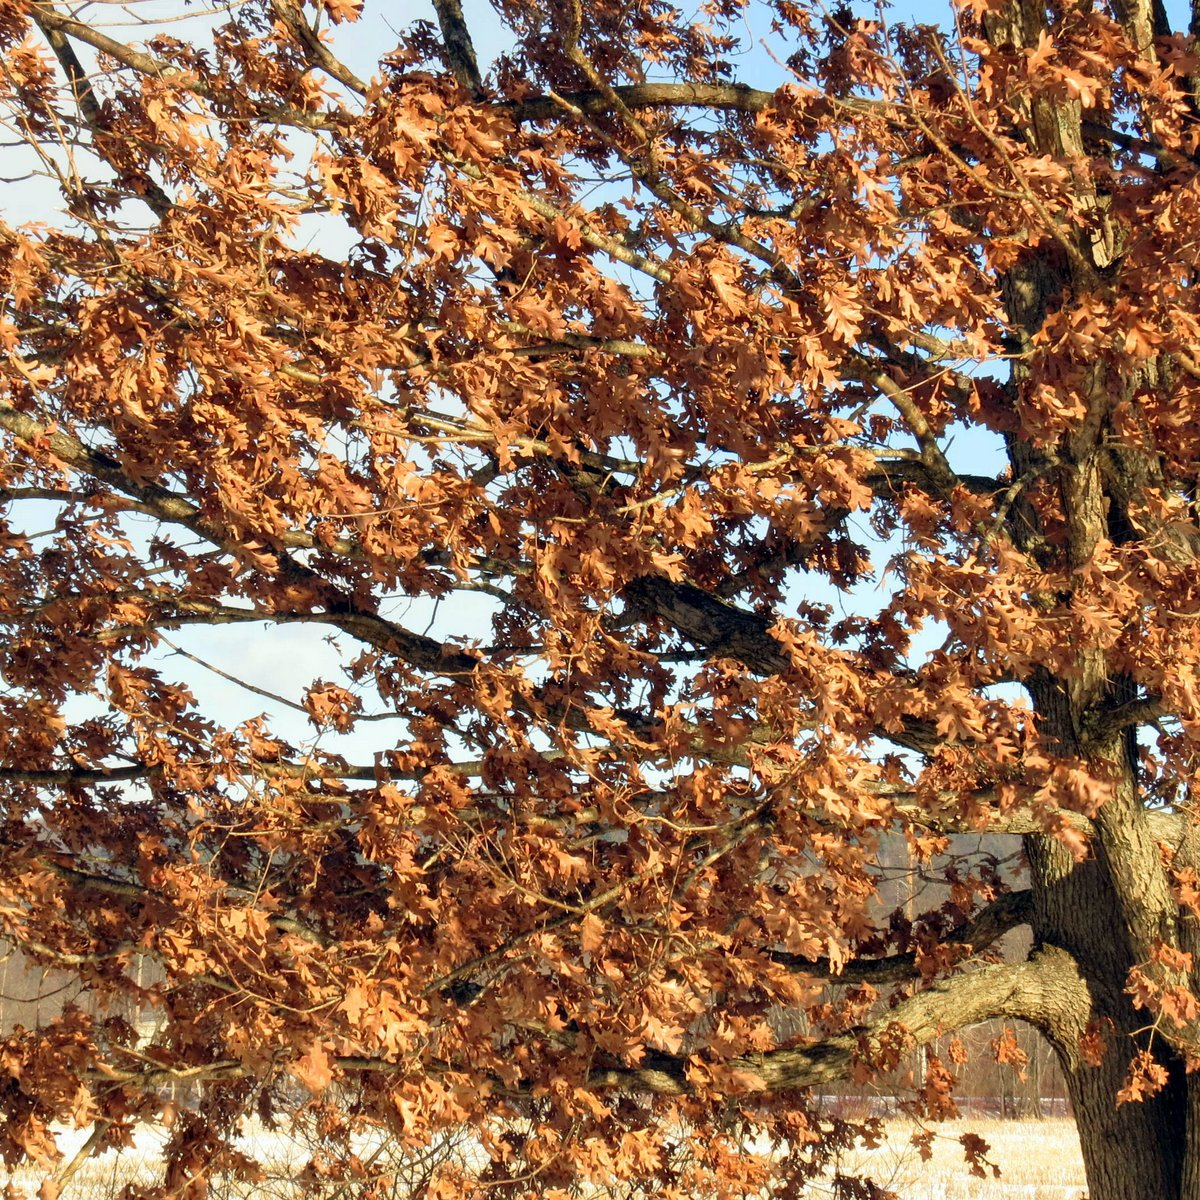 12. Oak Leaves